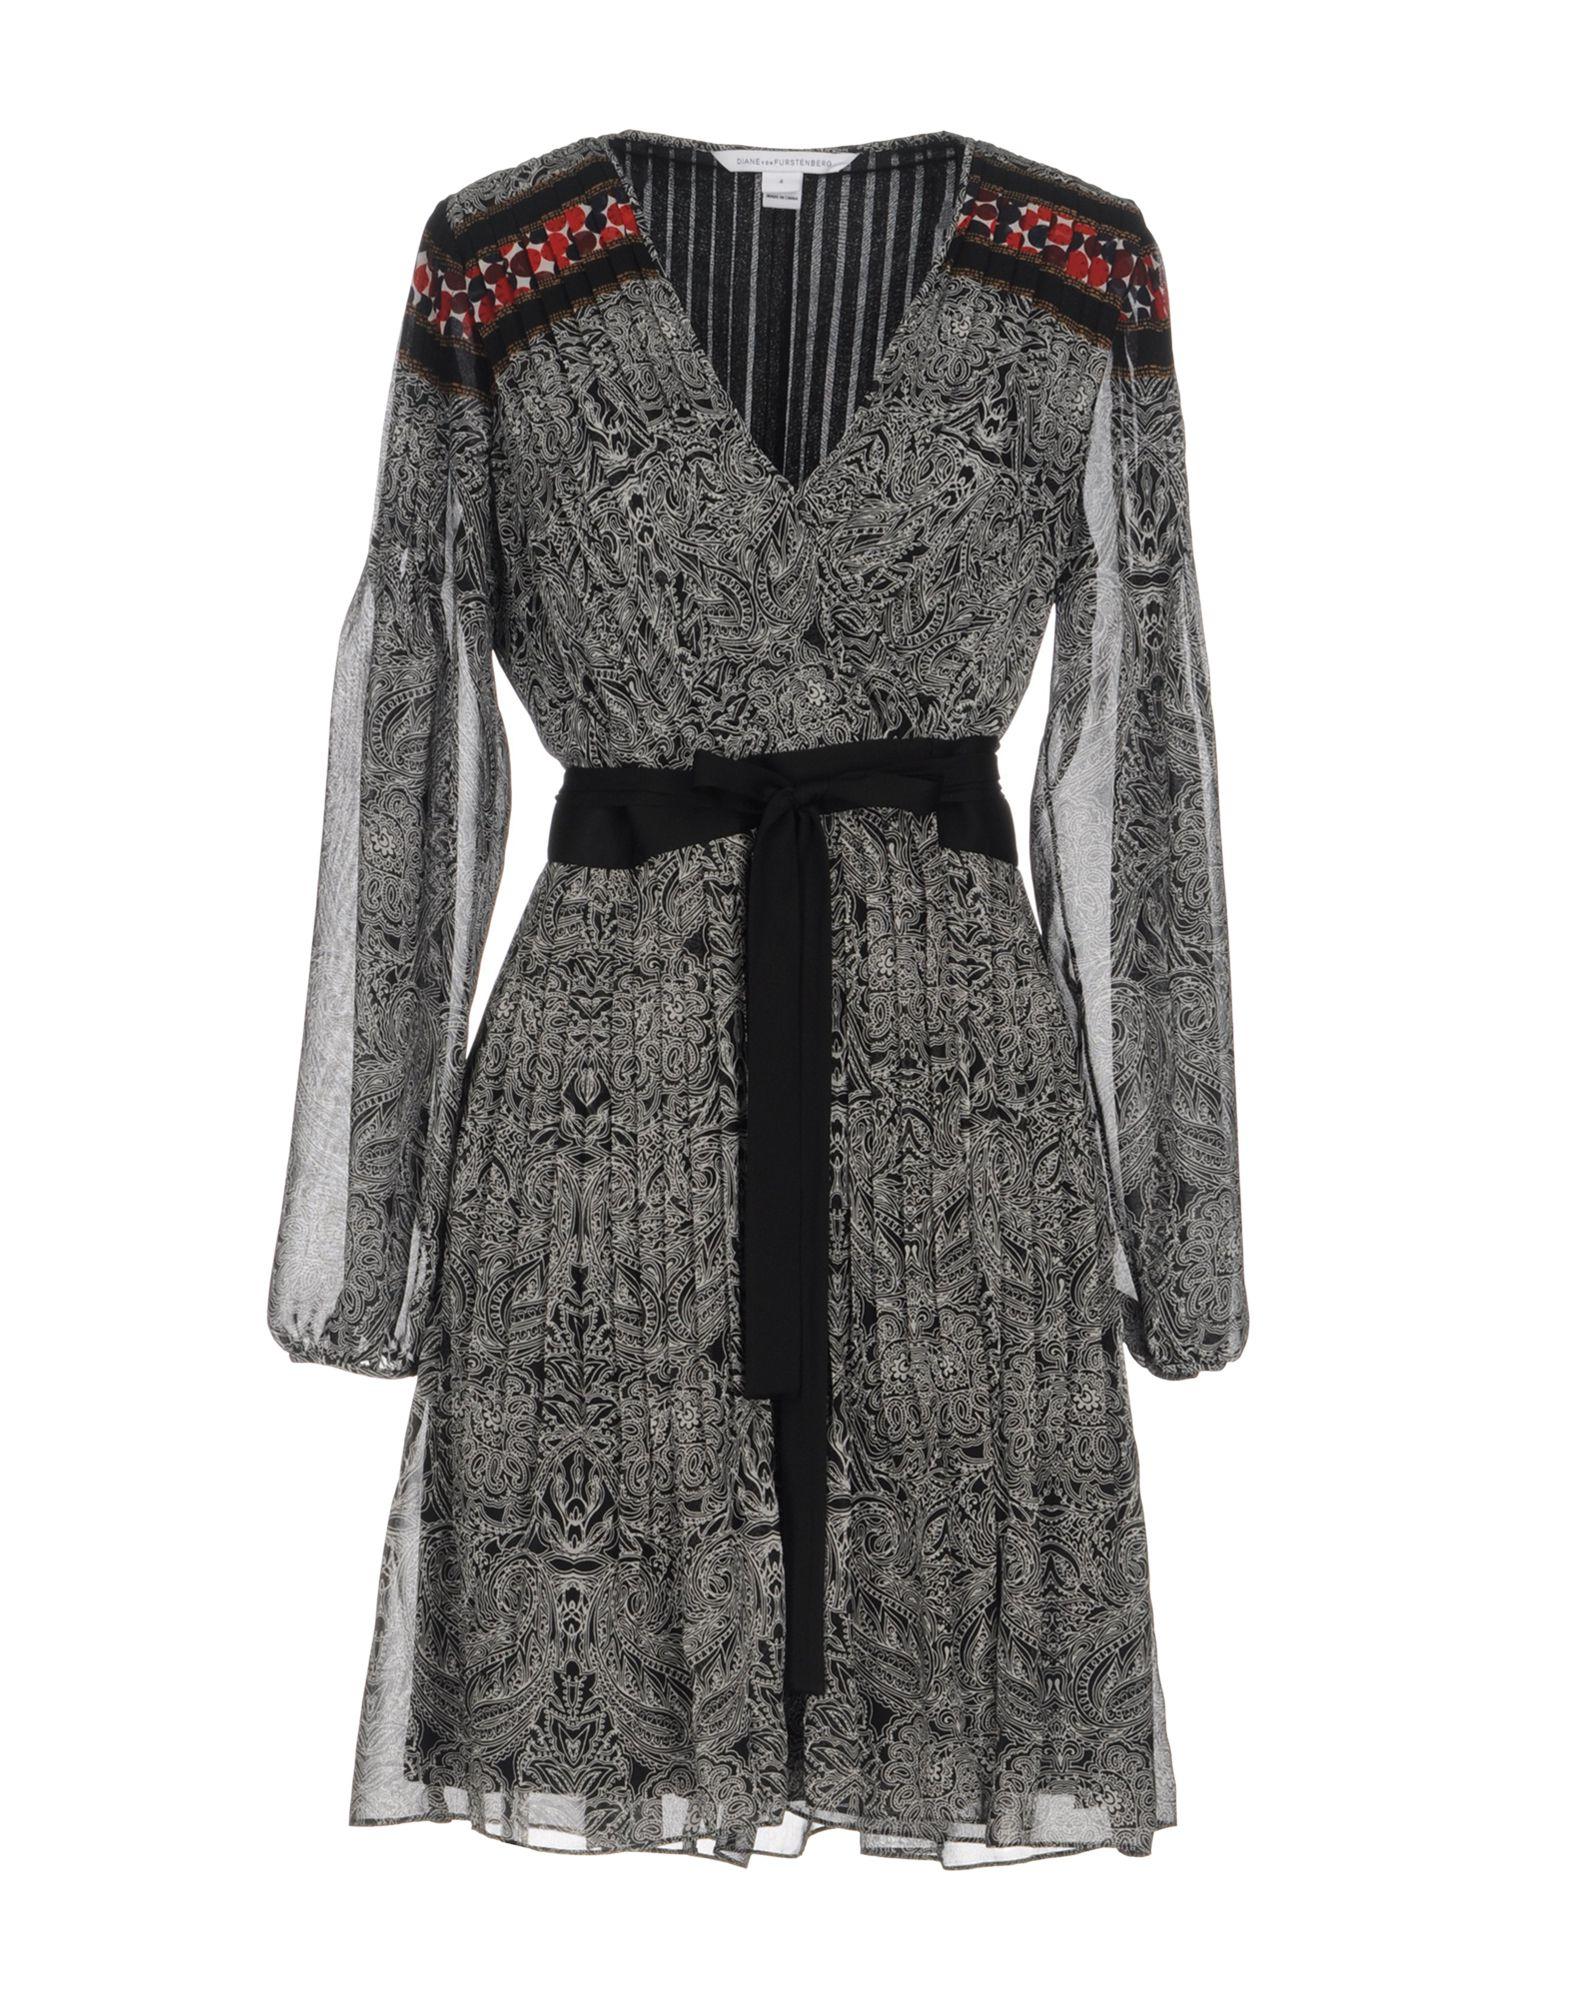 Vestito Corto Diane Von Furstenberg Donna - Acquista online su osR5qpB4